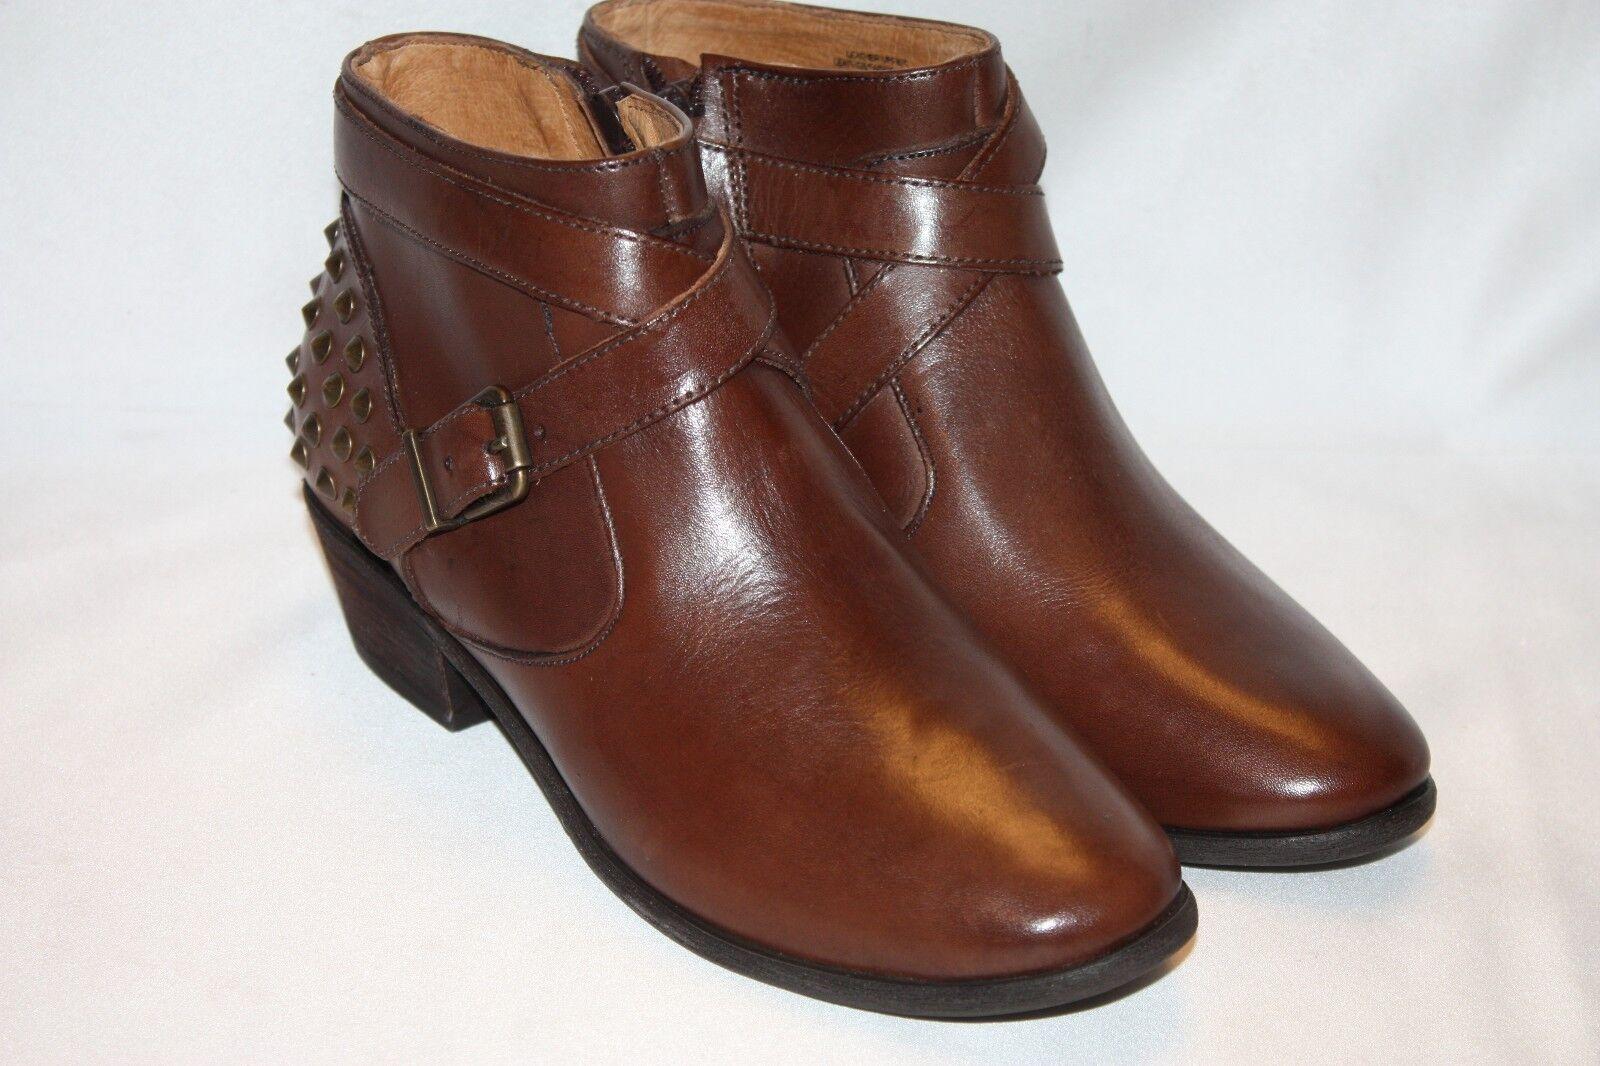 NEW  NIB  NURTURE Cognac Brown Leather FLINT Spike Buckle Ankle Boot Sz 6  130